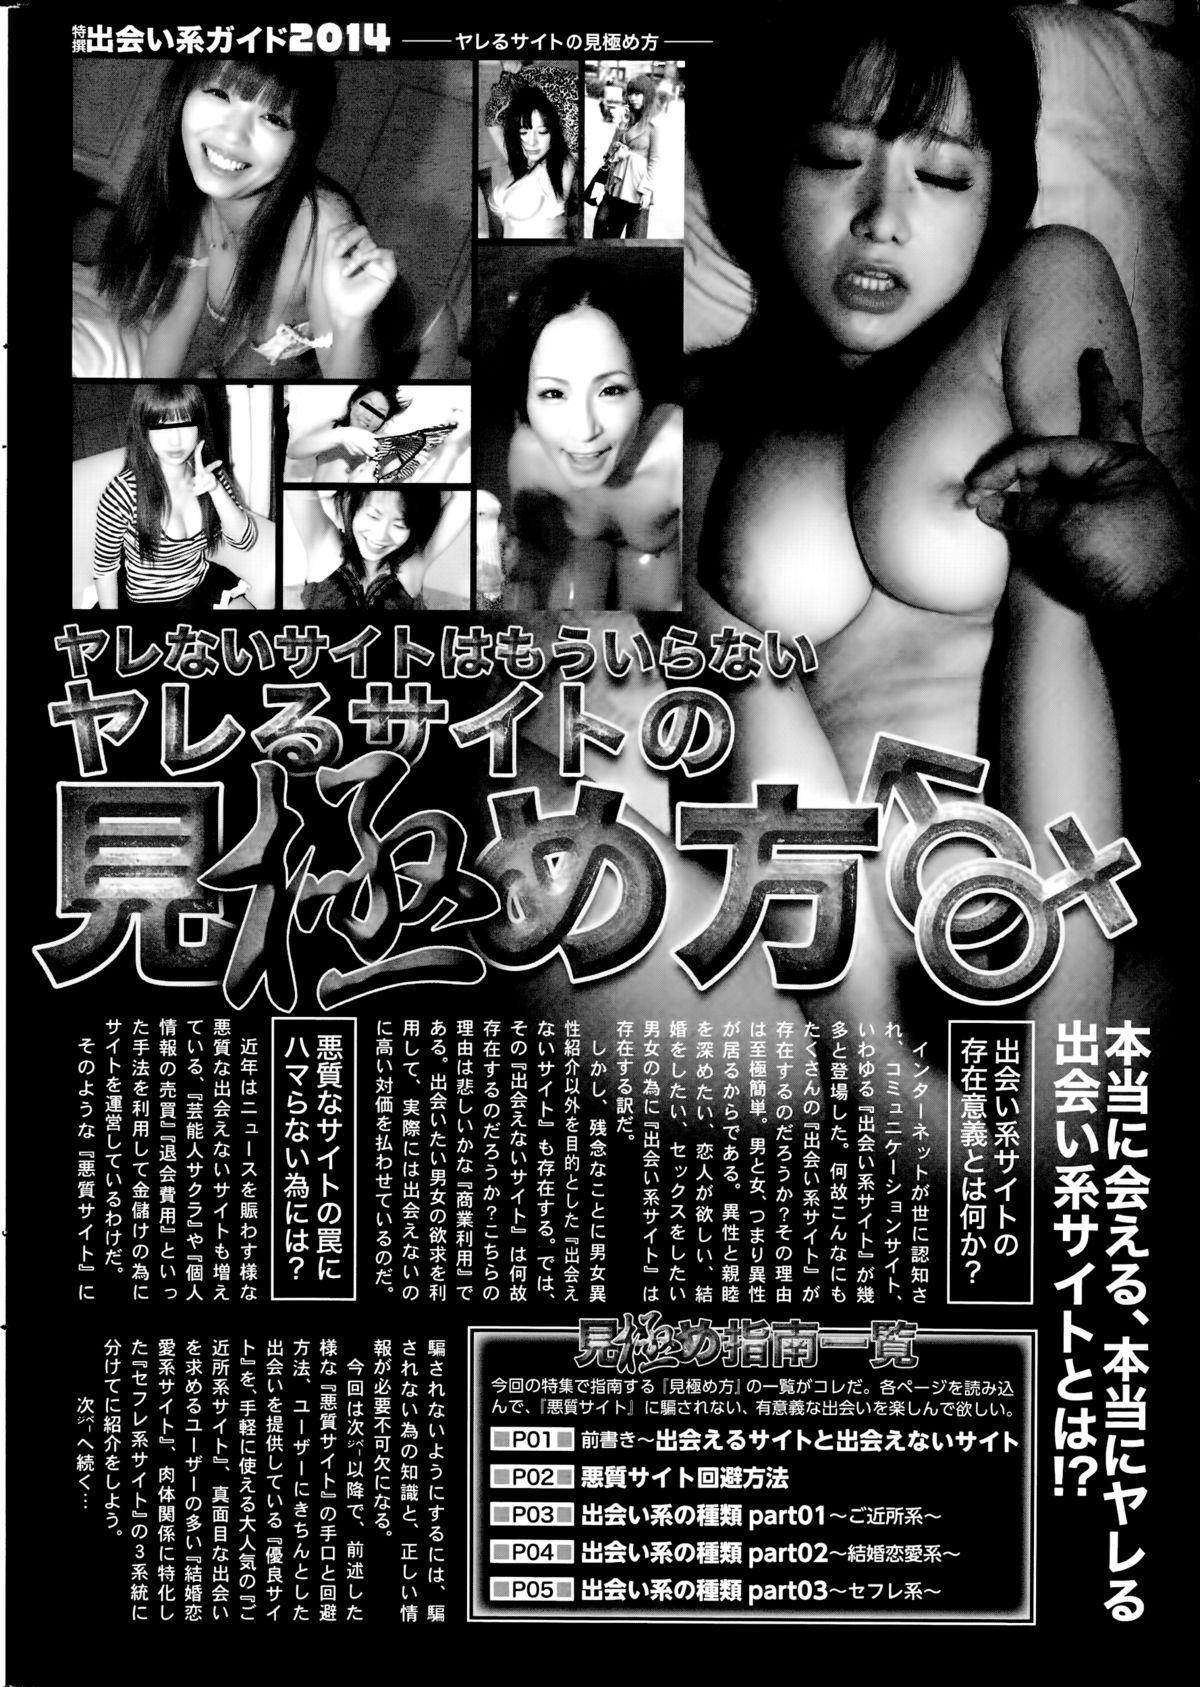 COMIC SIGMA 2014-09 Vol.81 251